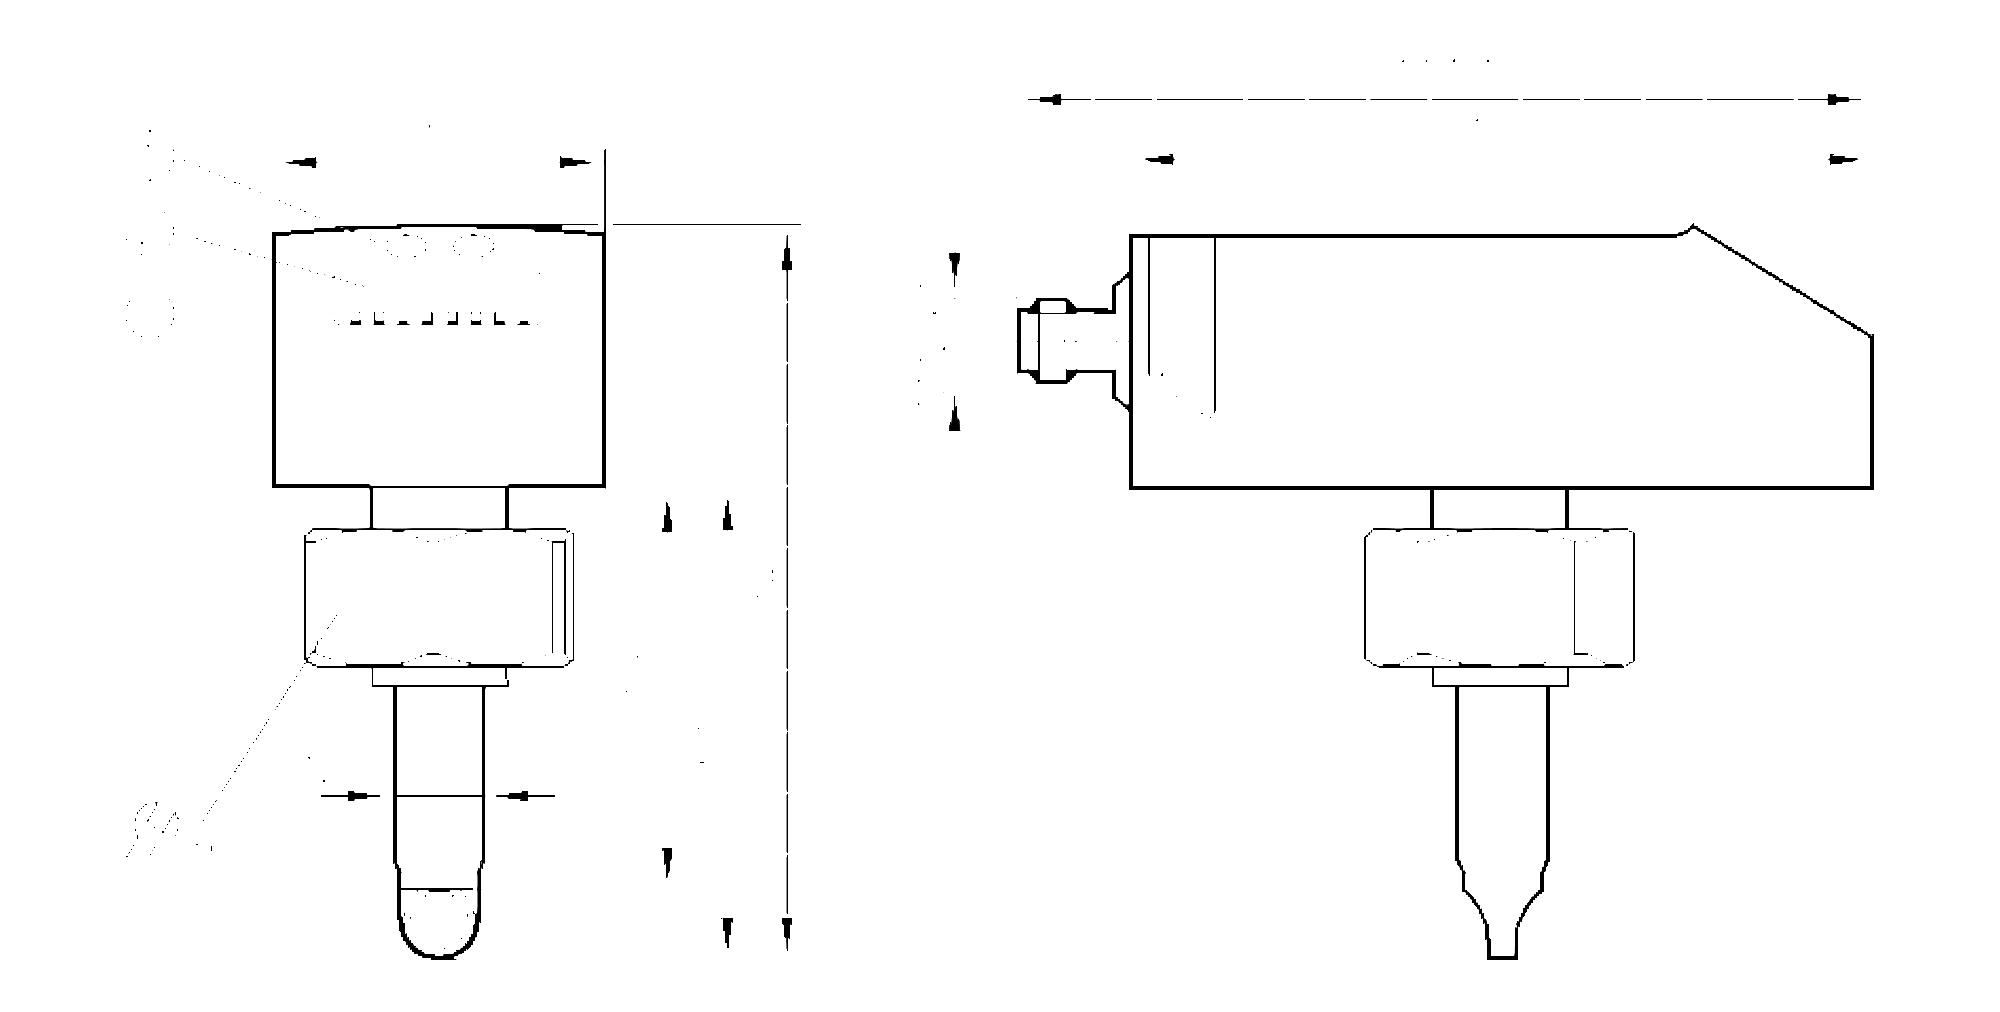 sd0523 - compressed air meter